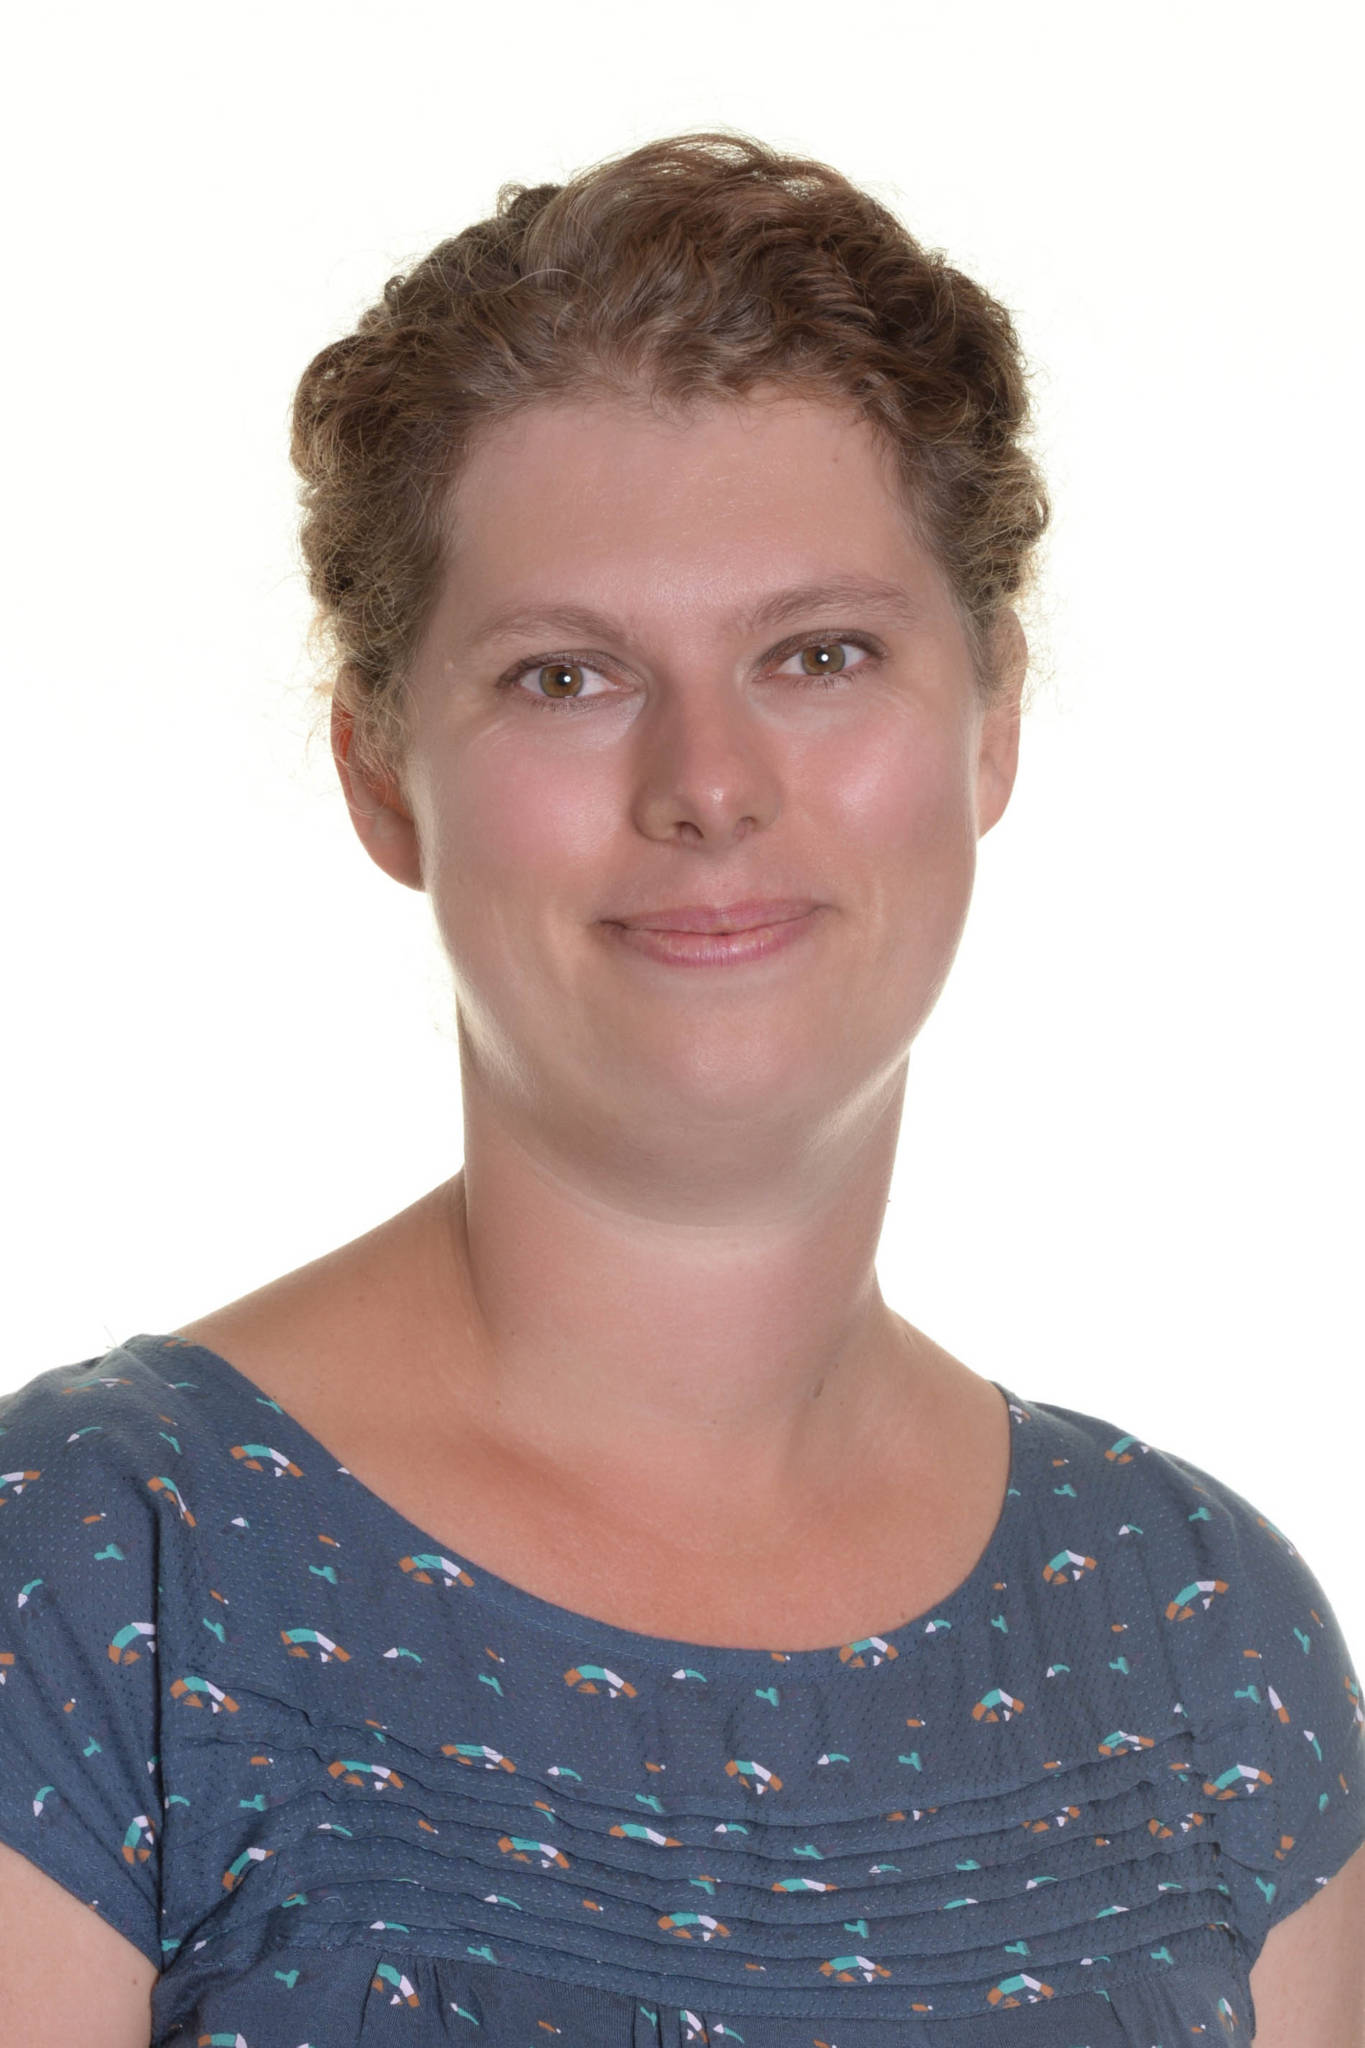 Christina Tromholt Krogh, CK